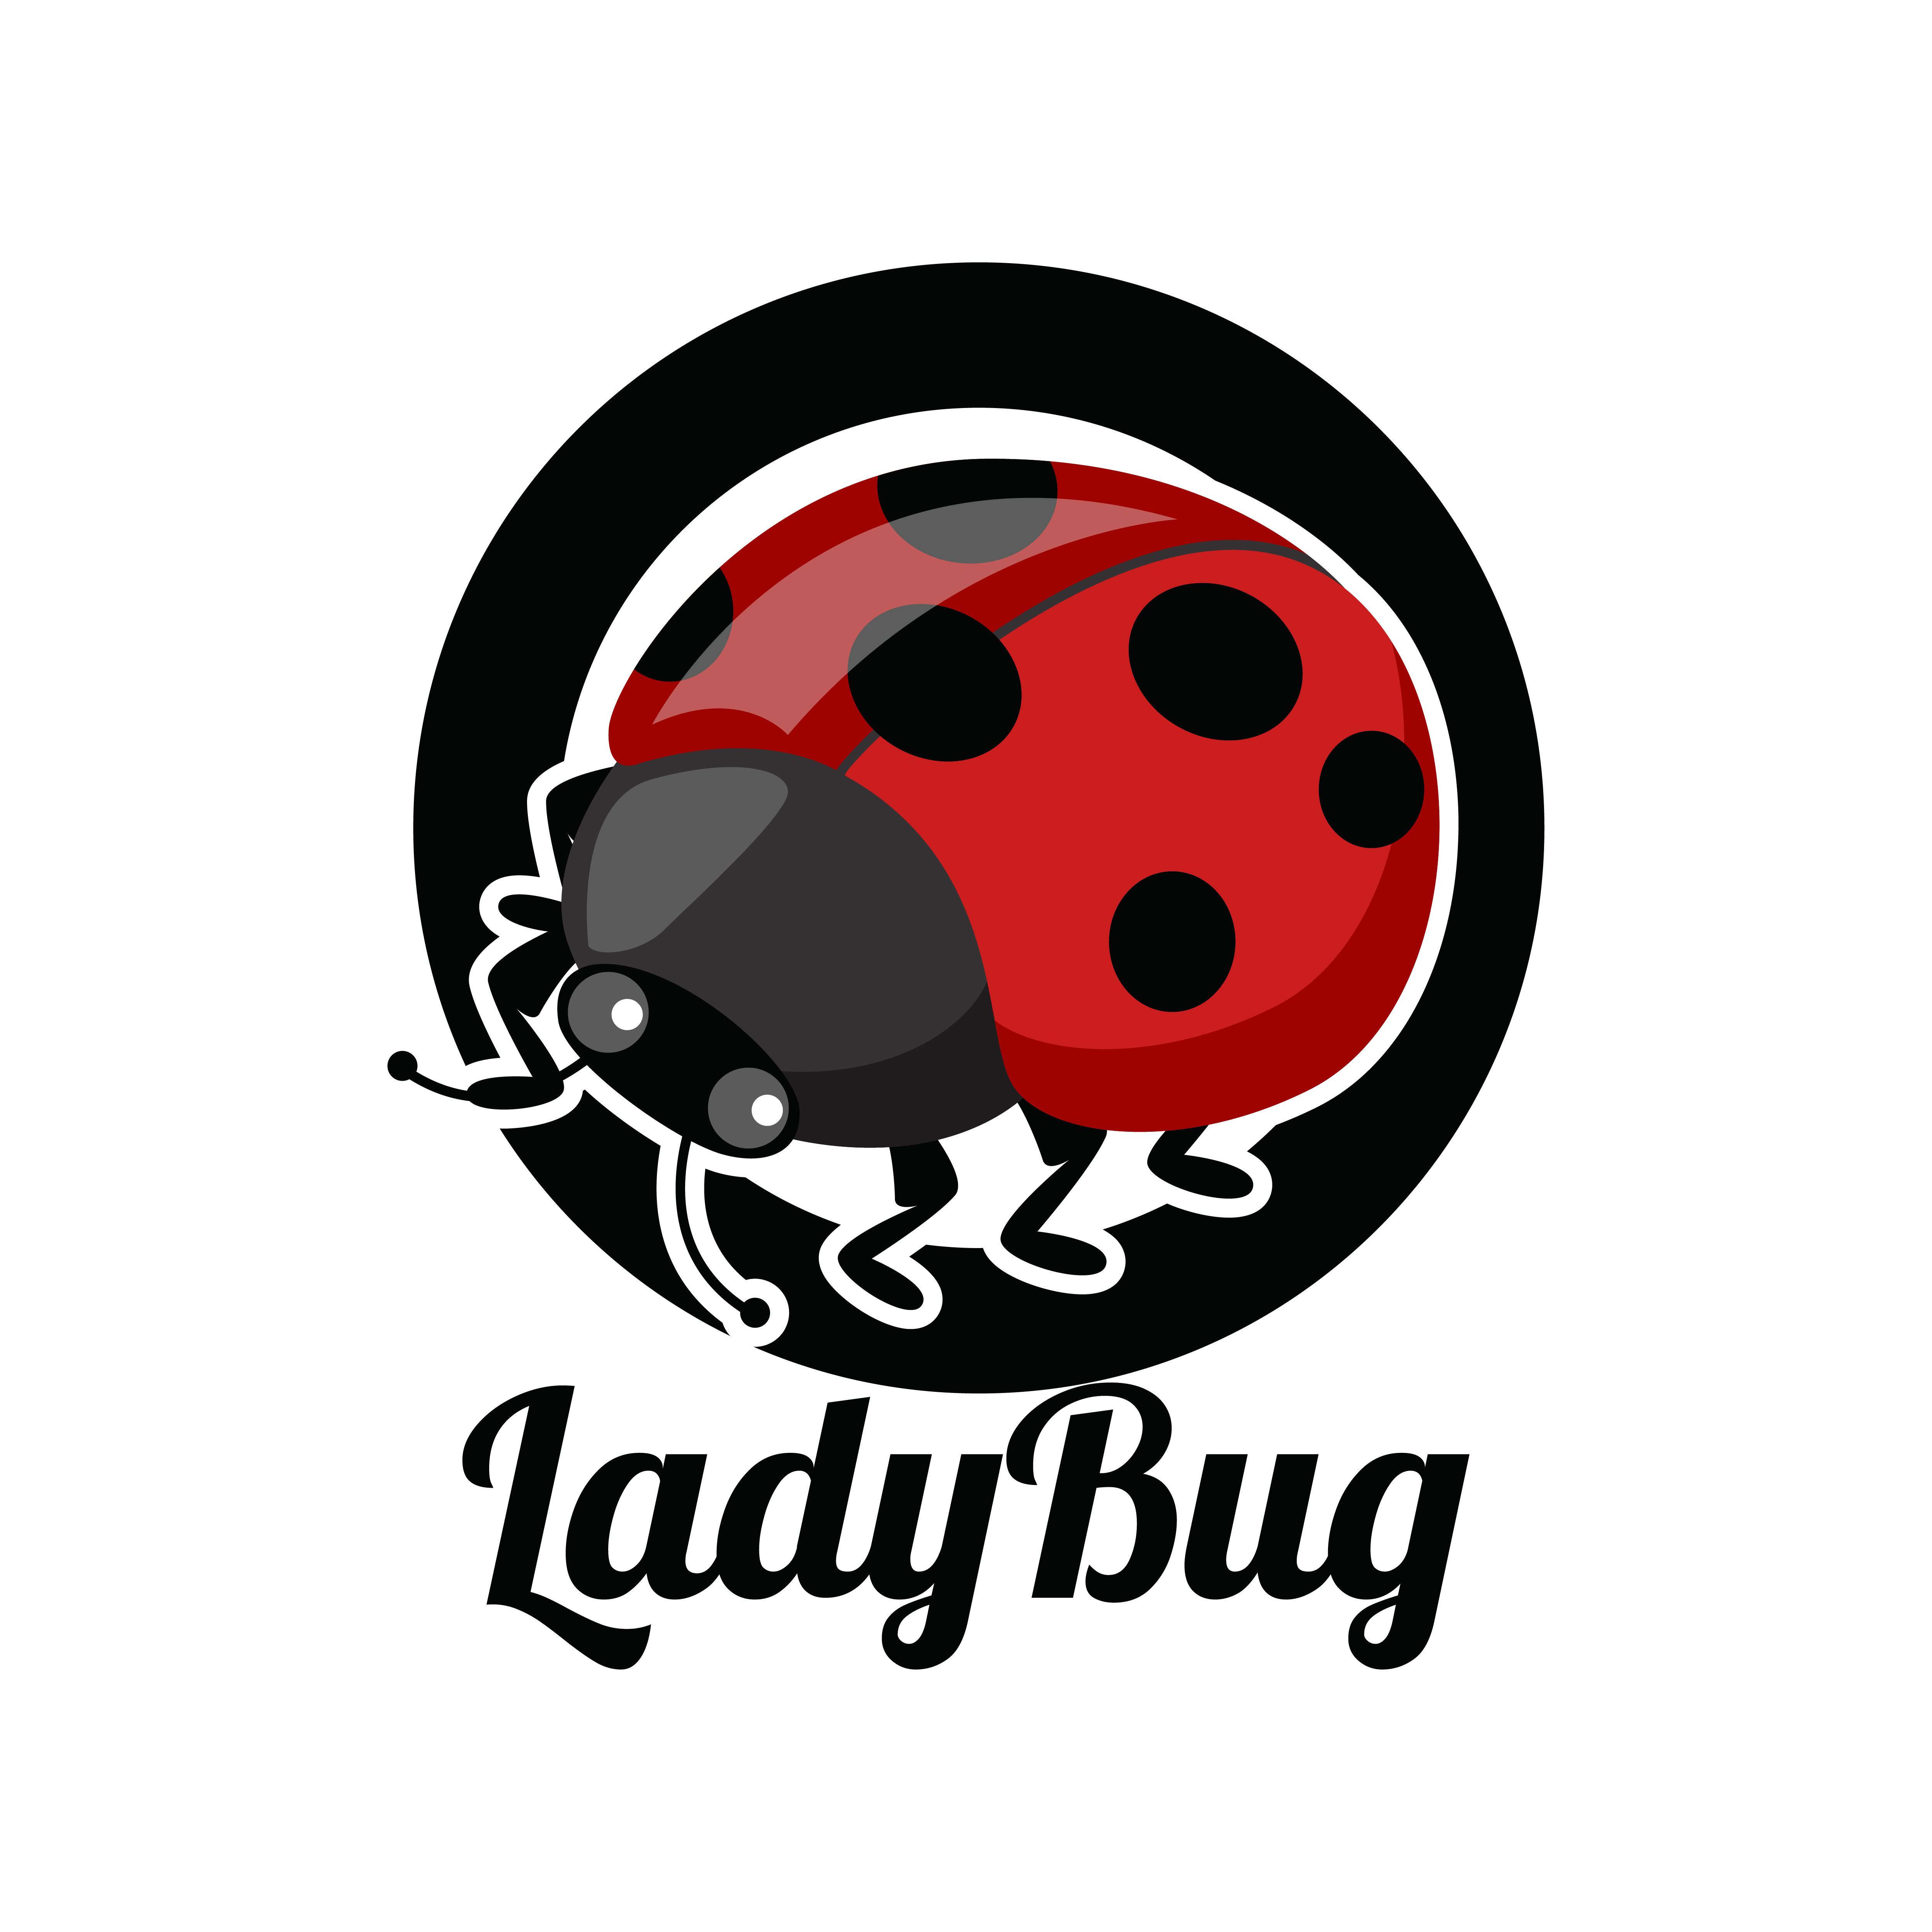 Cute Cartoon Birthday Wallpaper Ladybug Cartoon Free Vector Art 122 Free Downloads